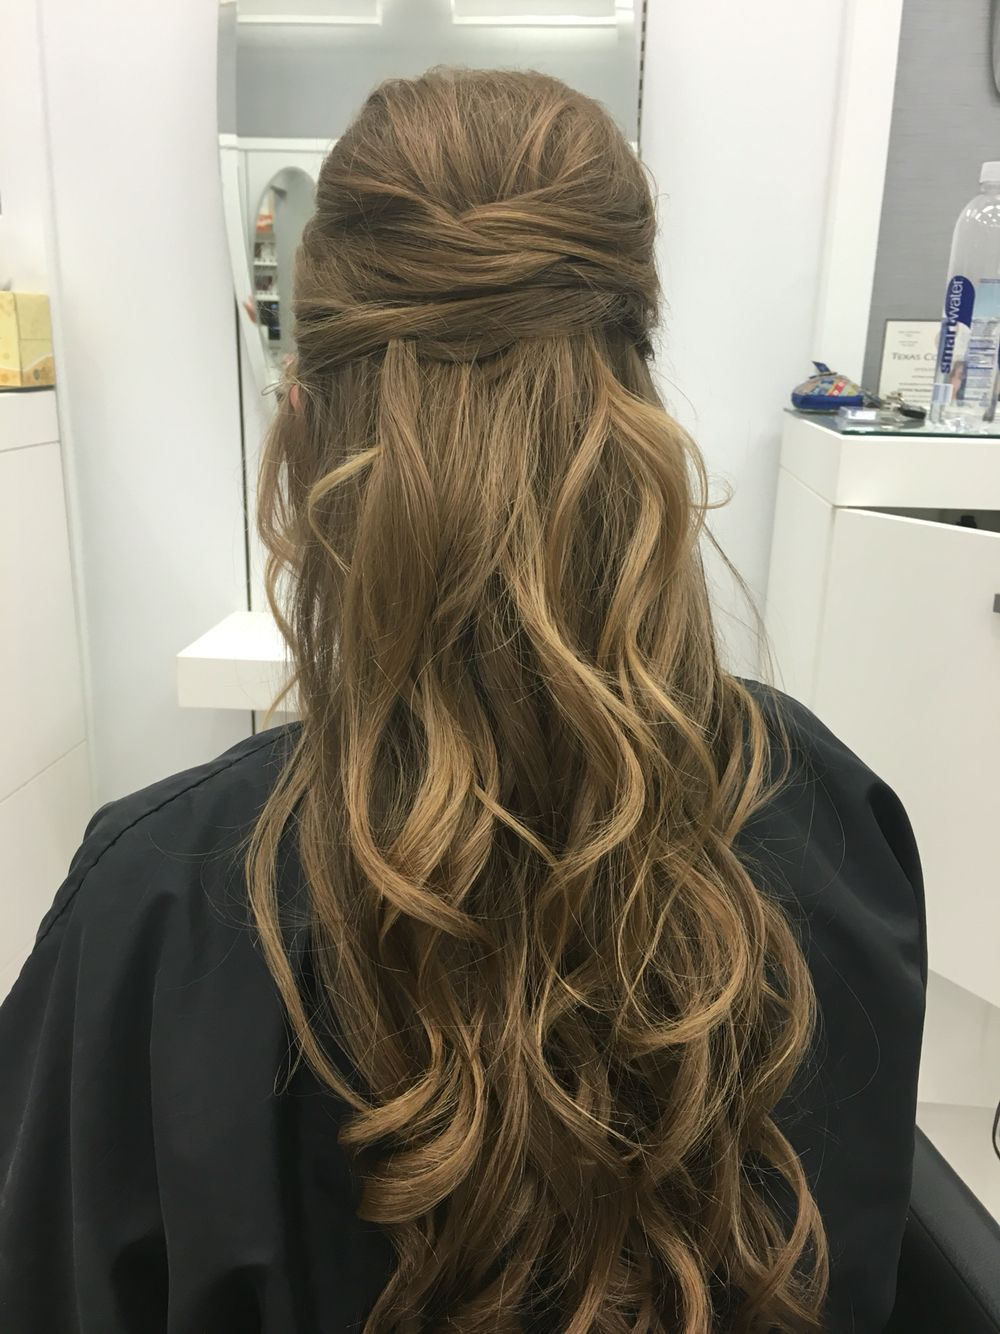 Prom Updo Elizabeth Sanchez Ulta Beauty Southlake Tx Ulta Beauty Beauty Prom Updos